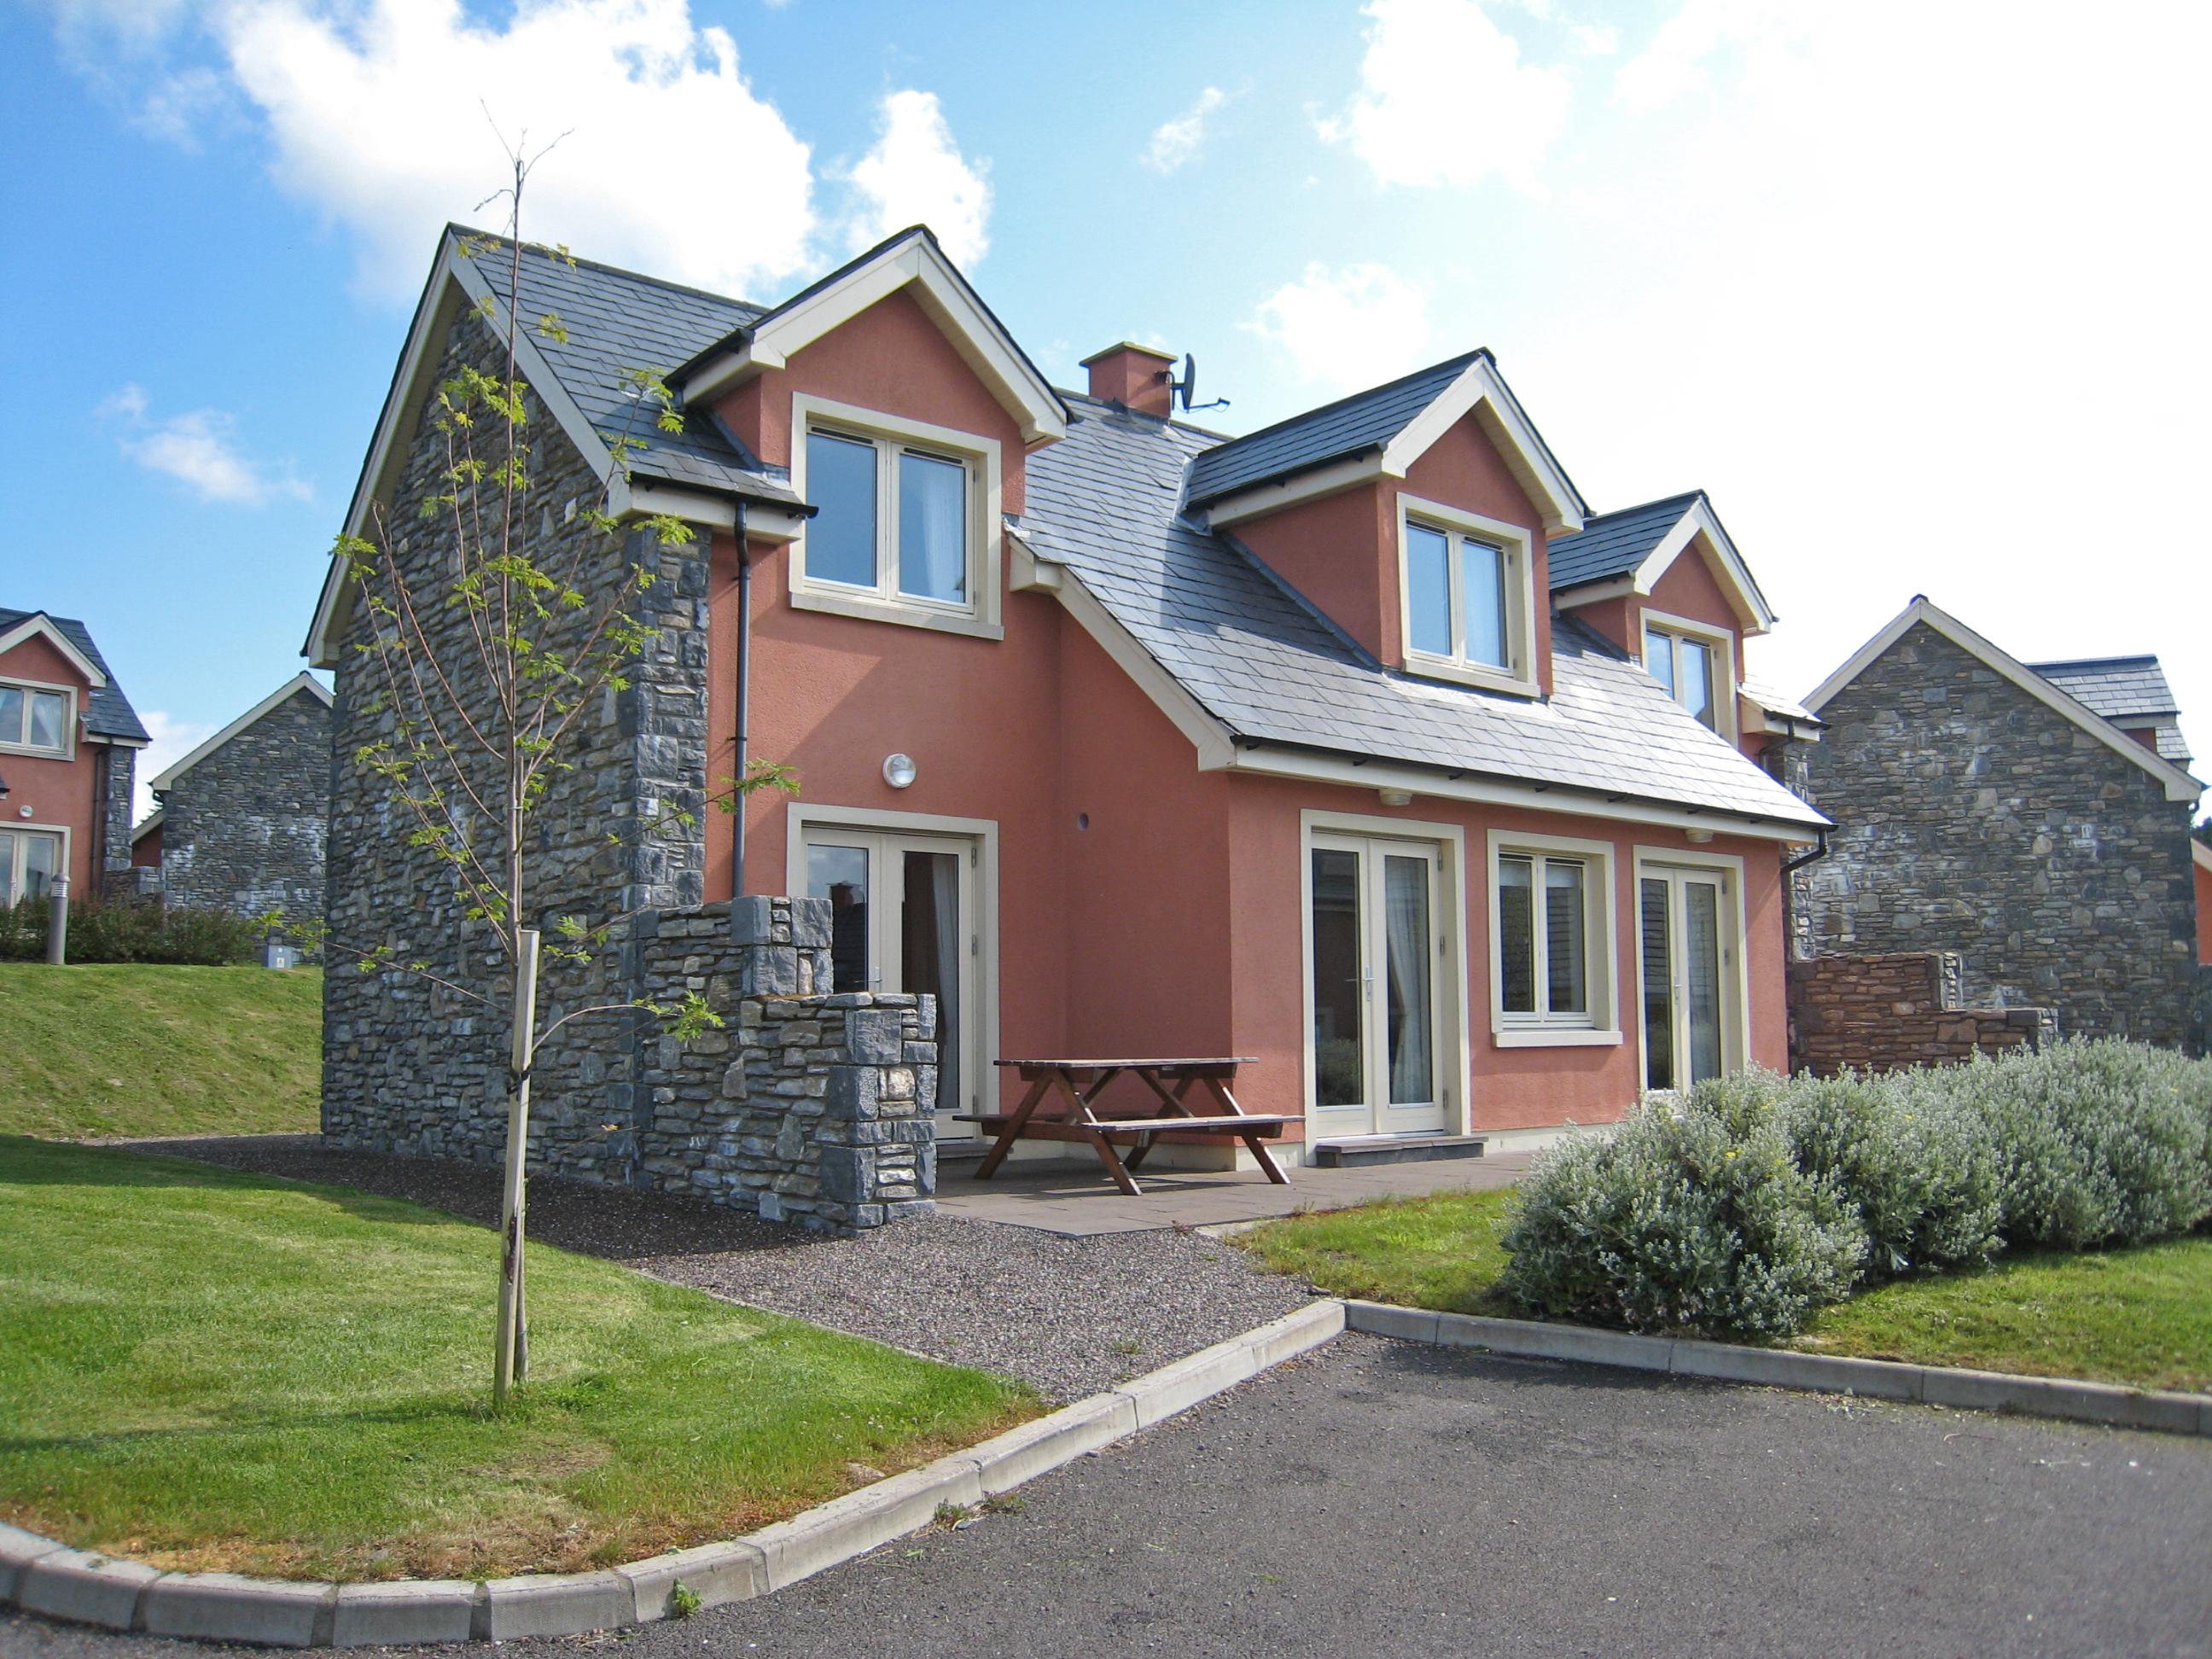 kenmare irlande maison de vacances ring of kerry cottages interhome. Black Bedroom Furniture Sets. Home Design Ideas